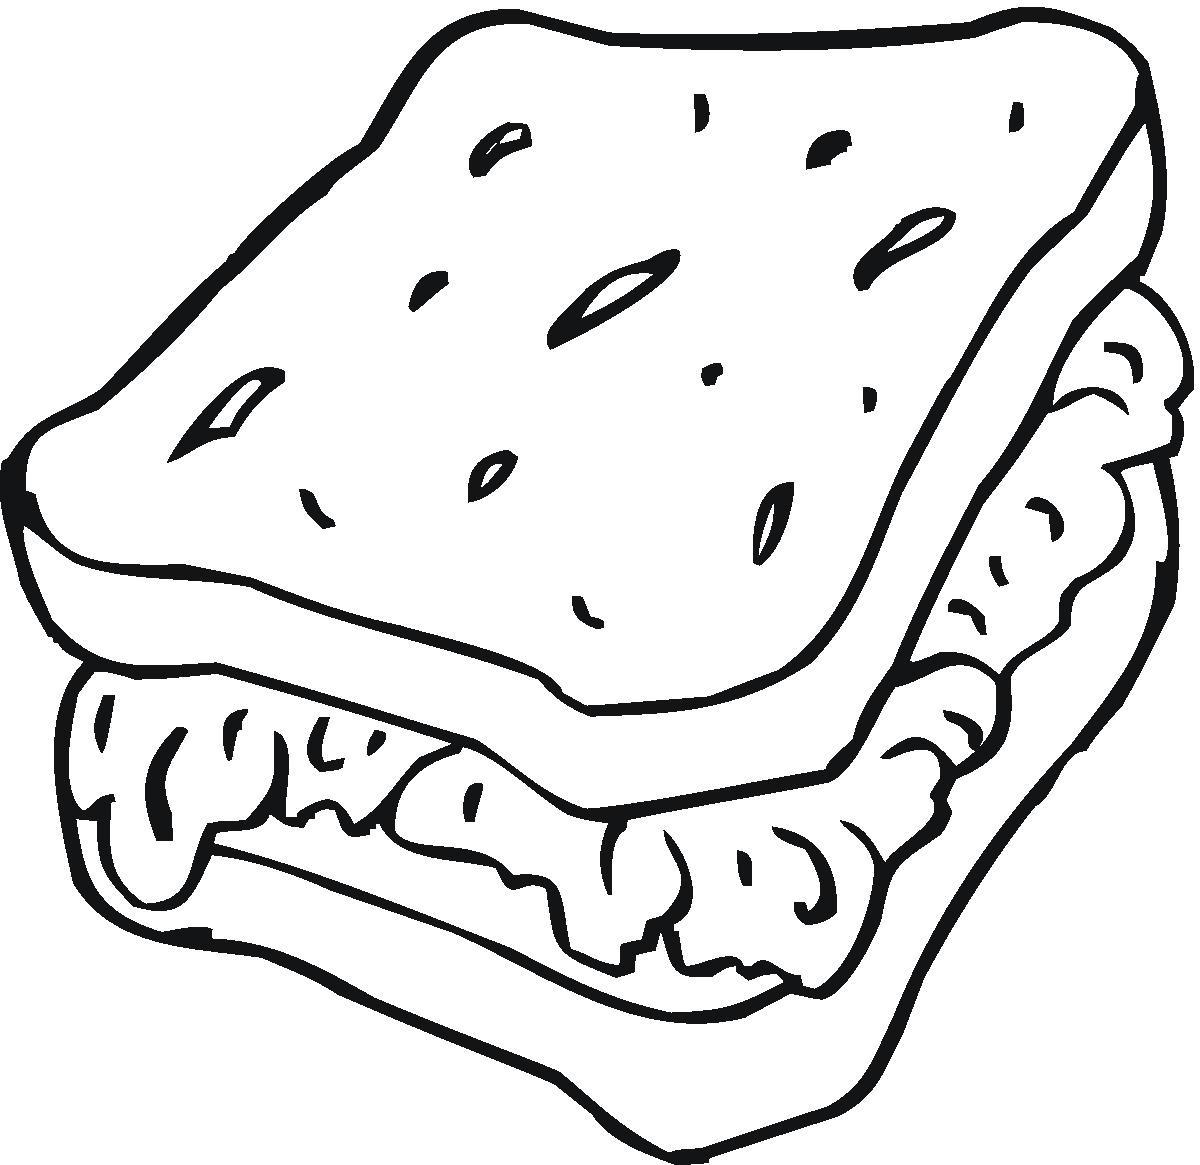 Slice Of Bread Drawing At Getdrawings